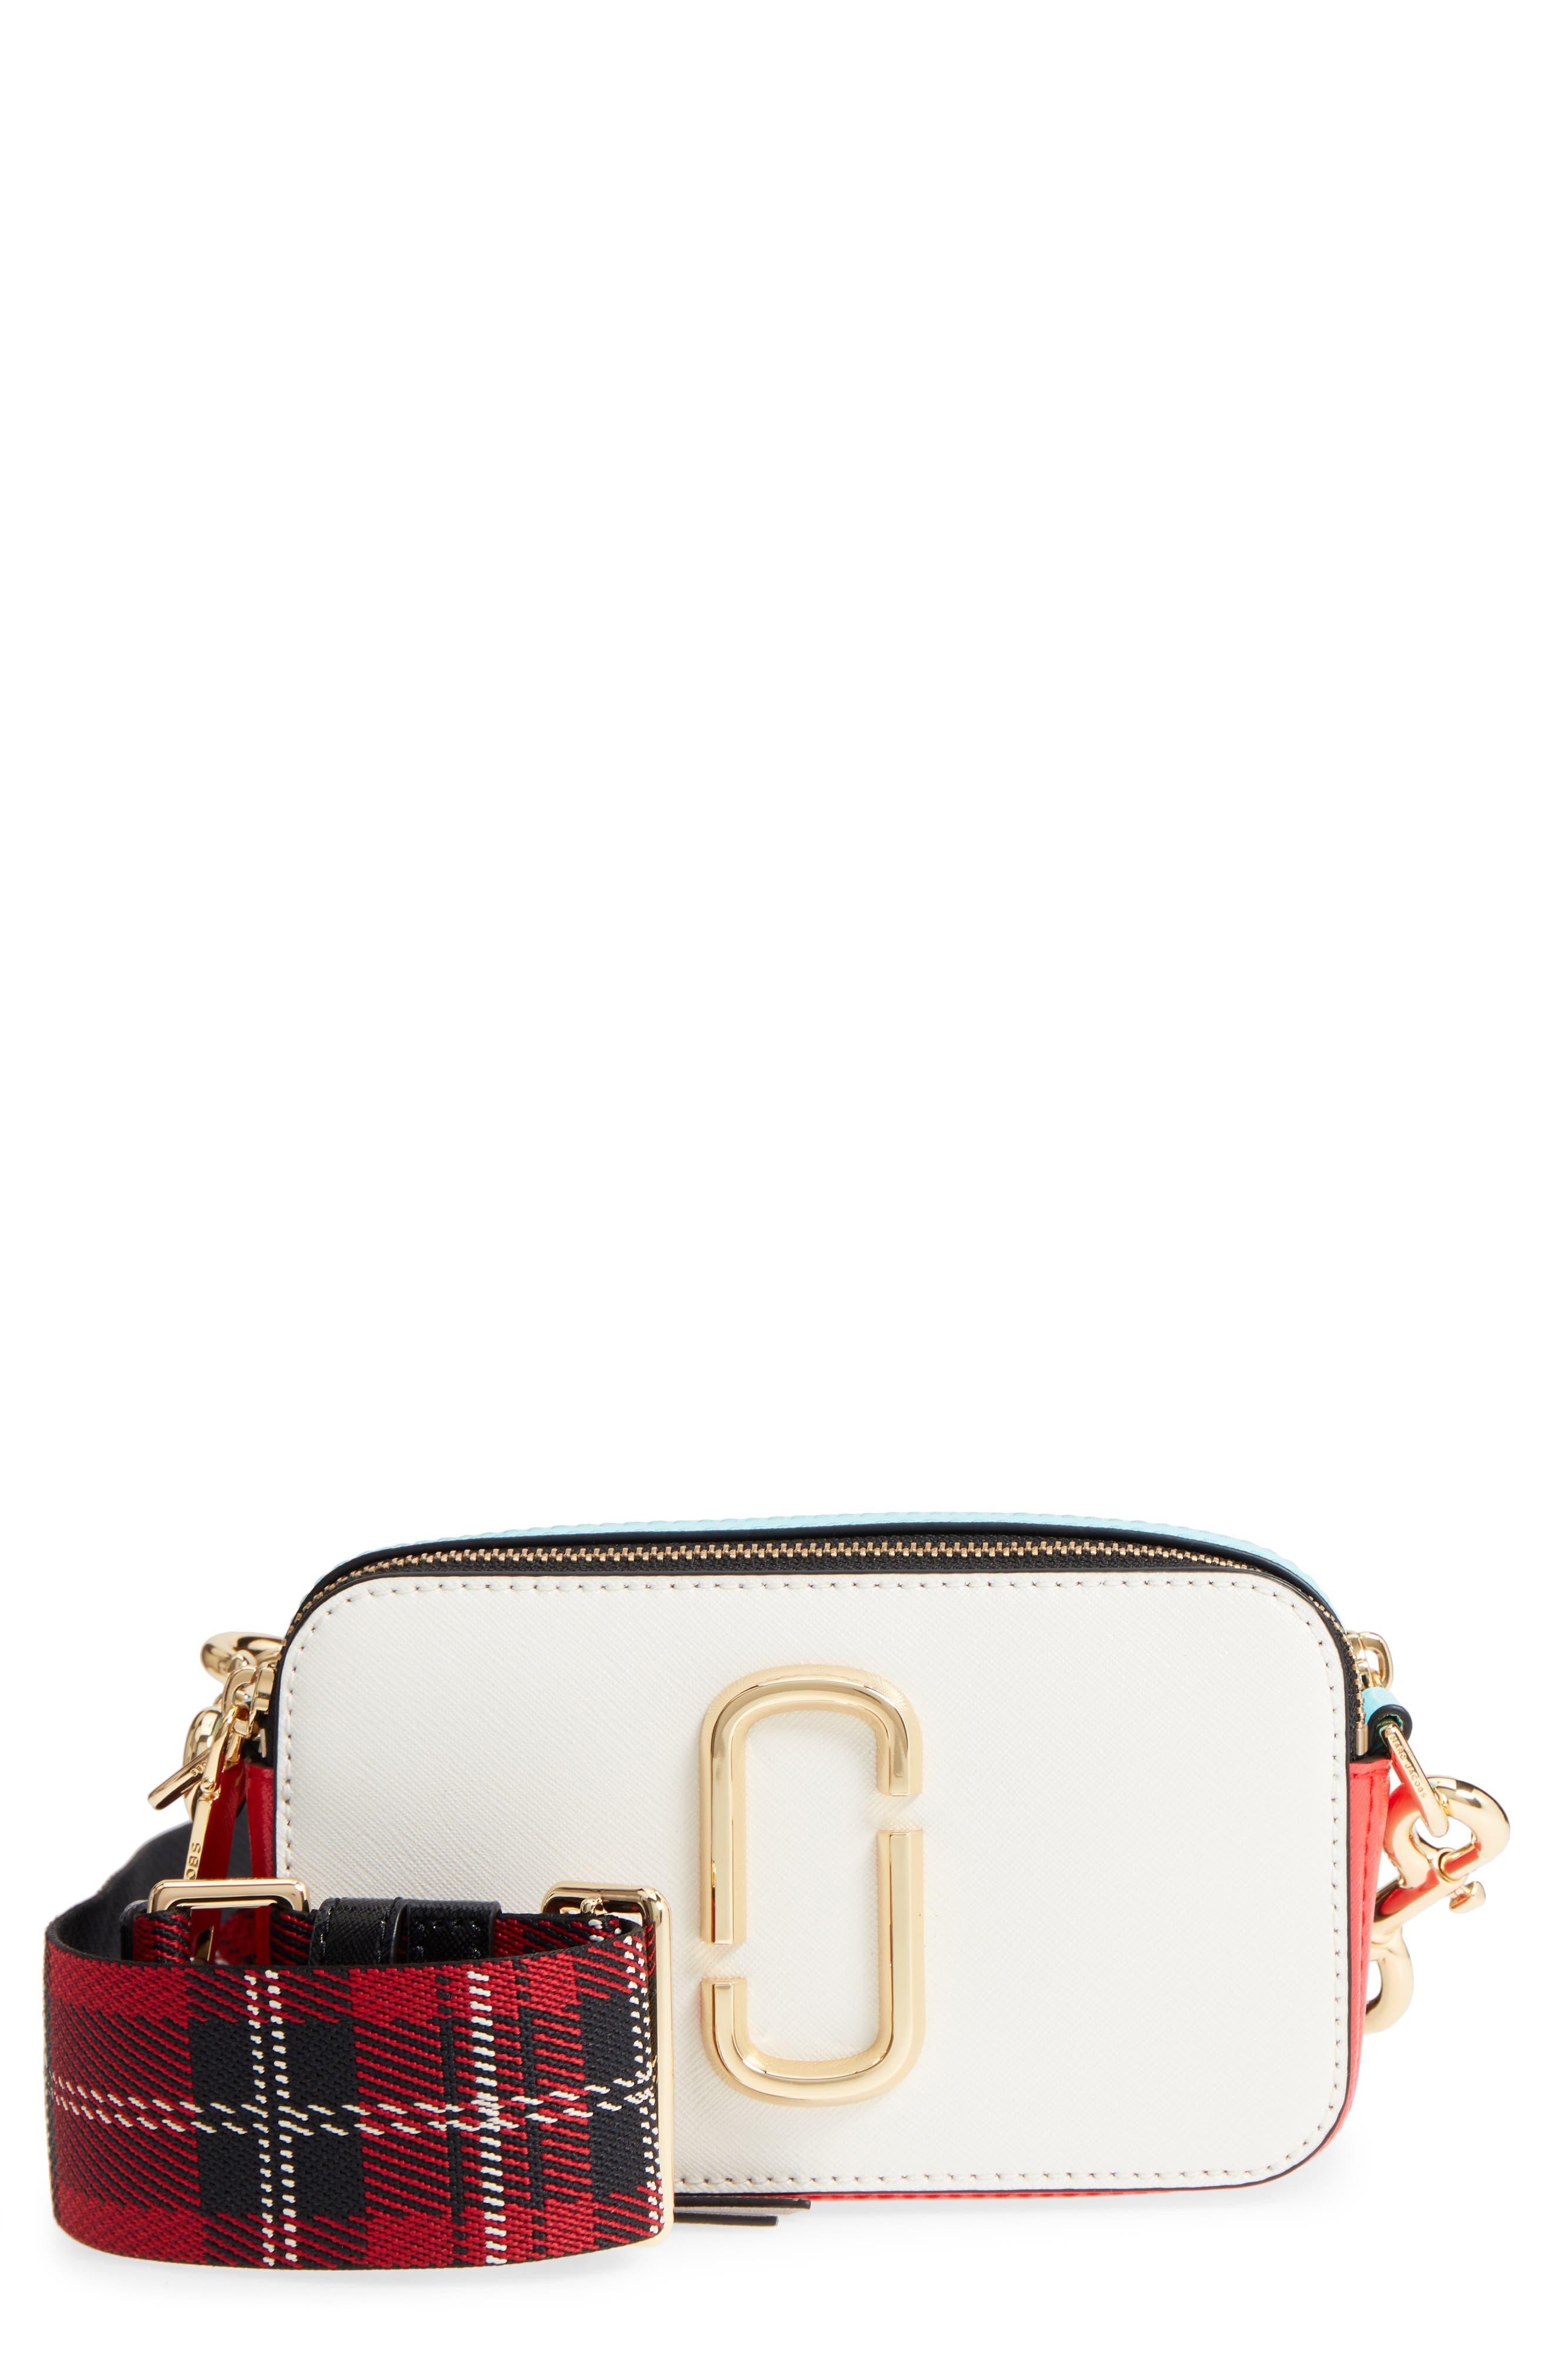 Snapshot Crossbody Bag,                         Main,                         color, Porcelain Multi